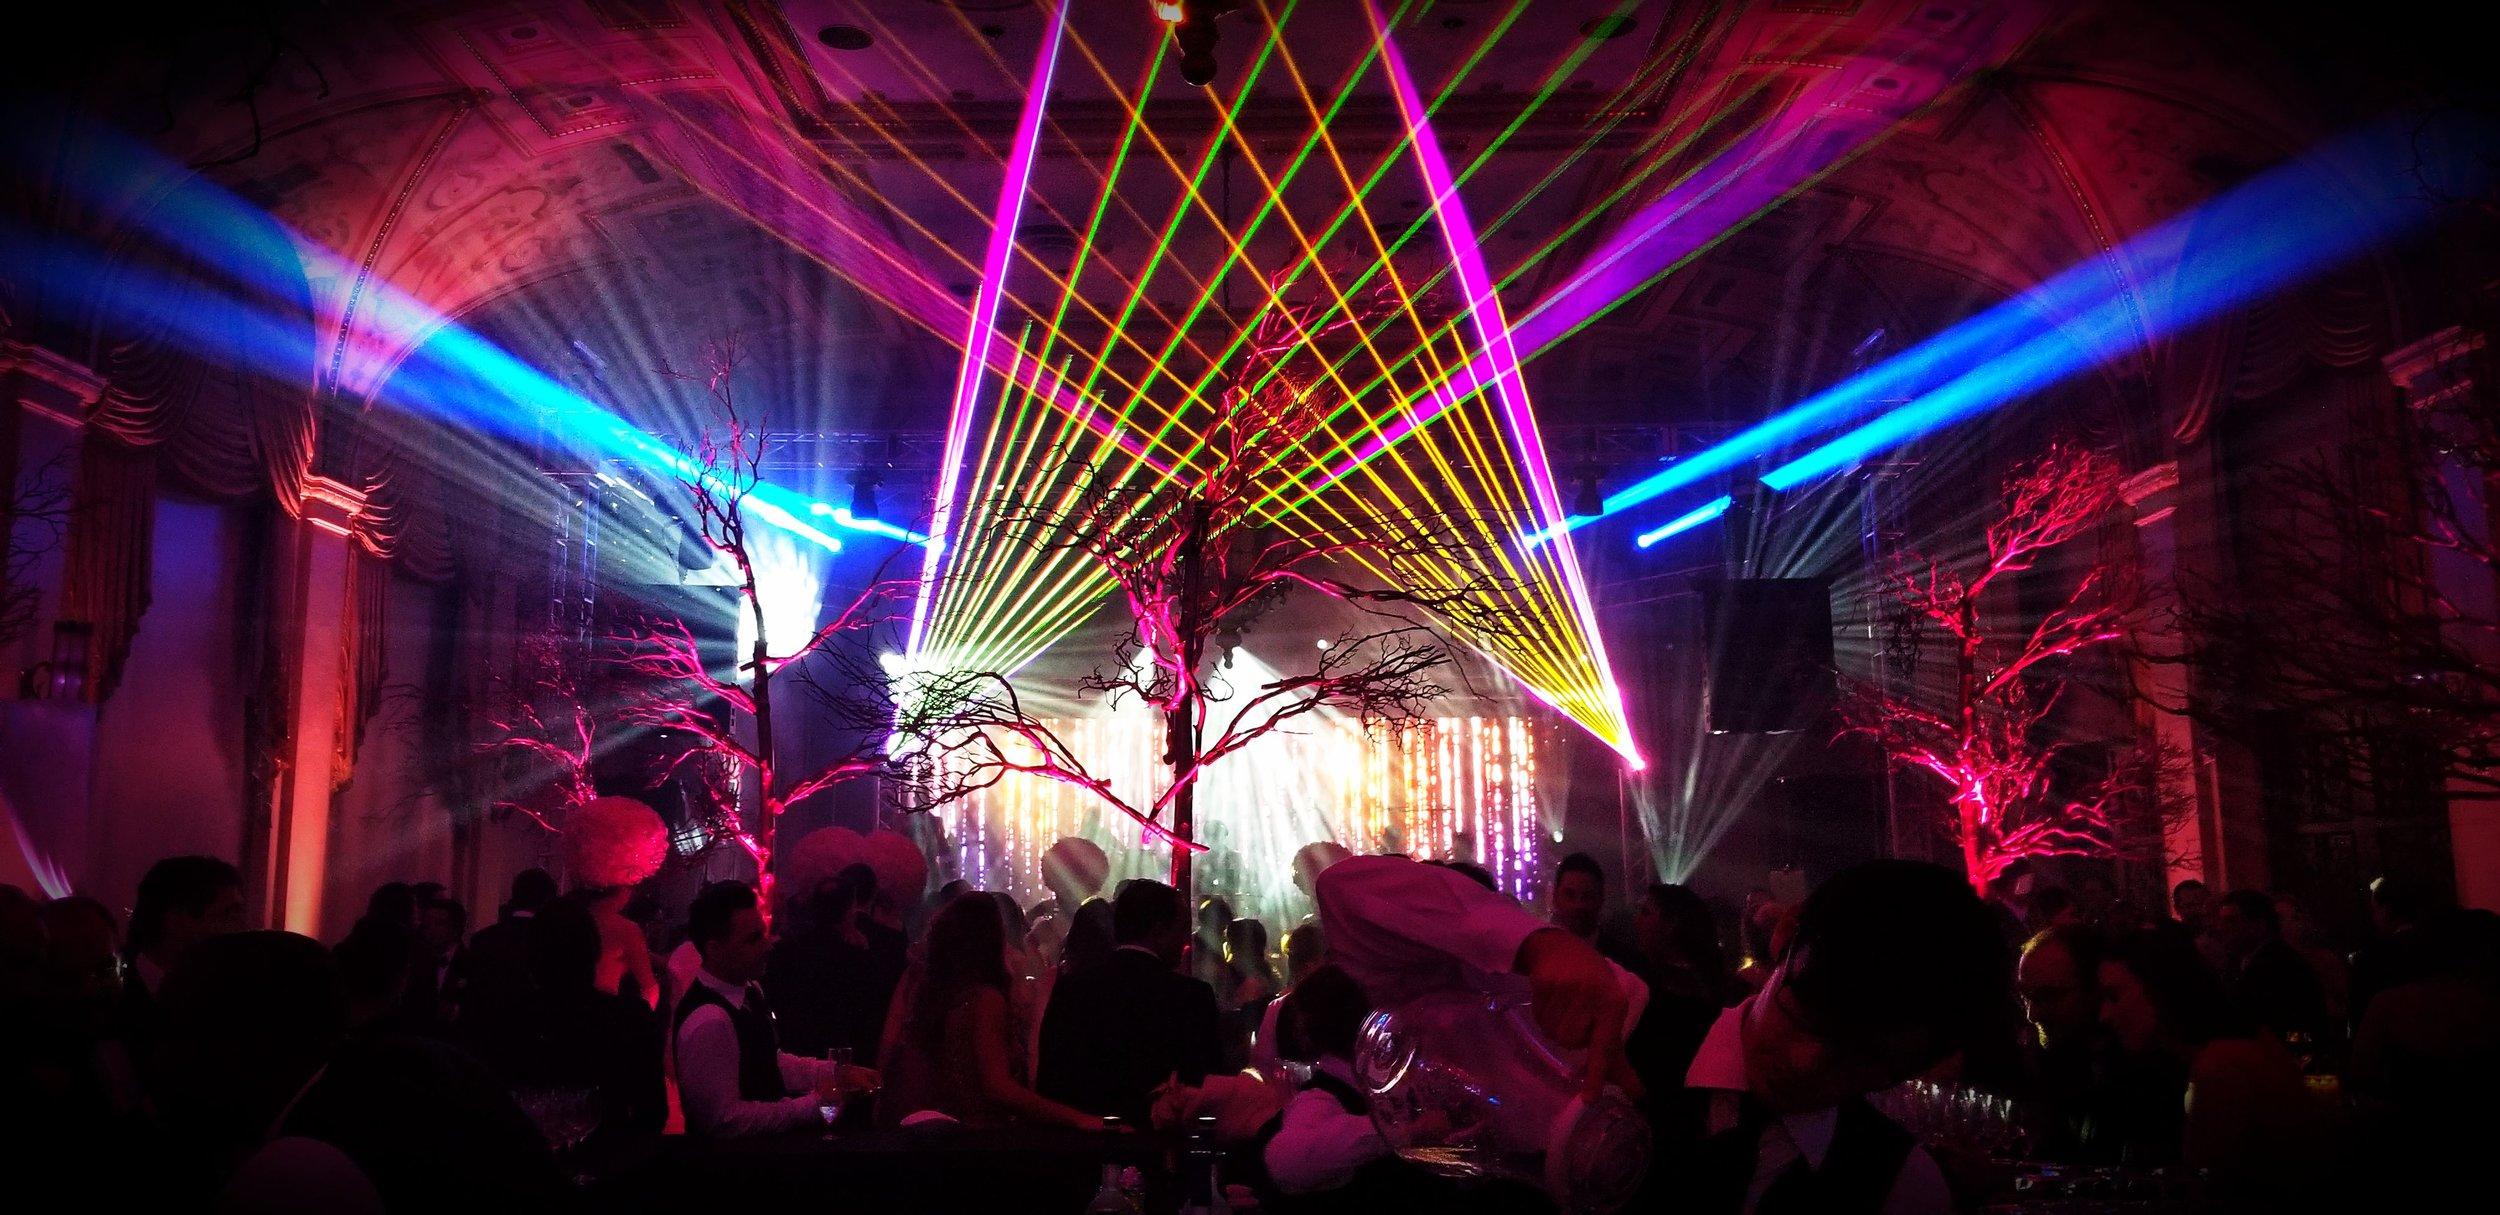 Laser-Lit After Parties -